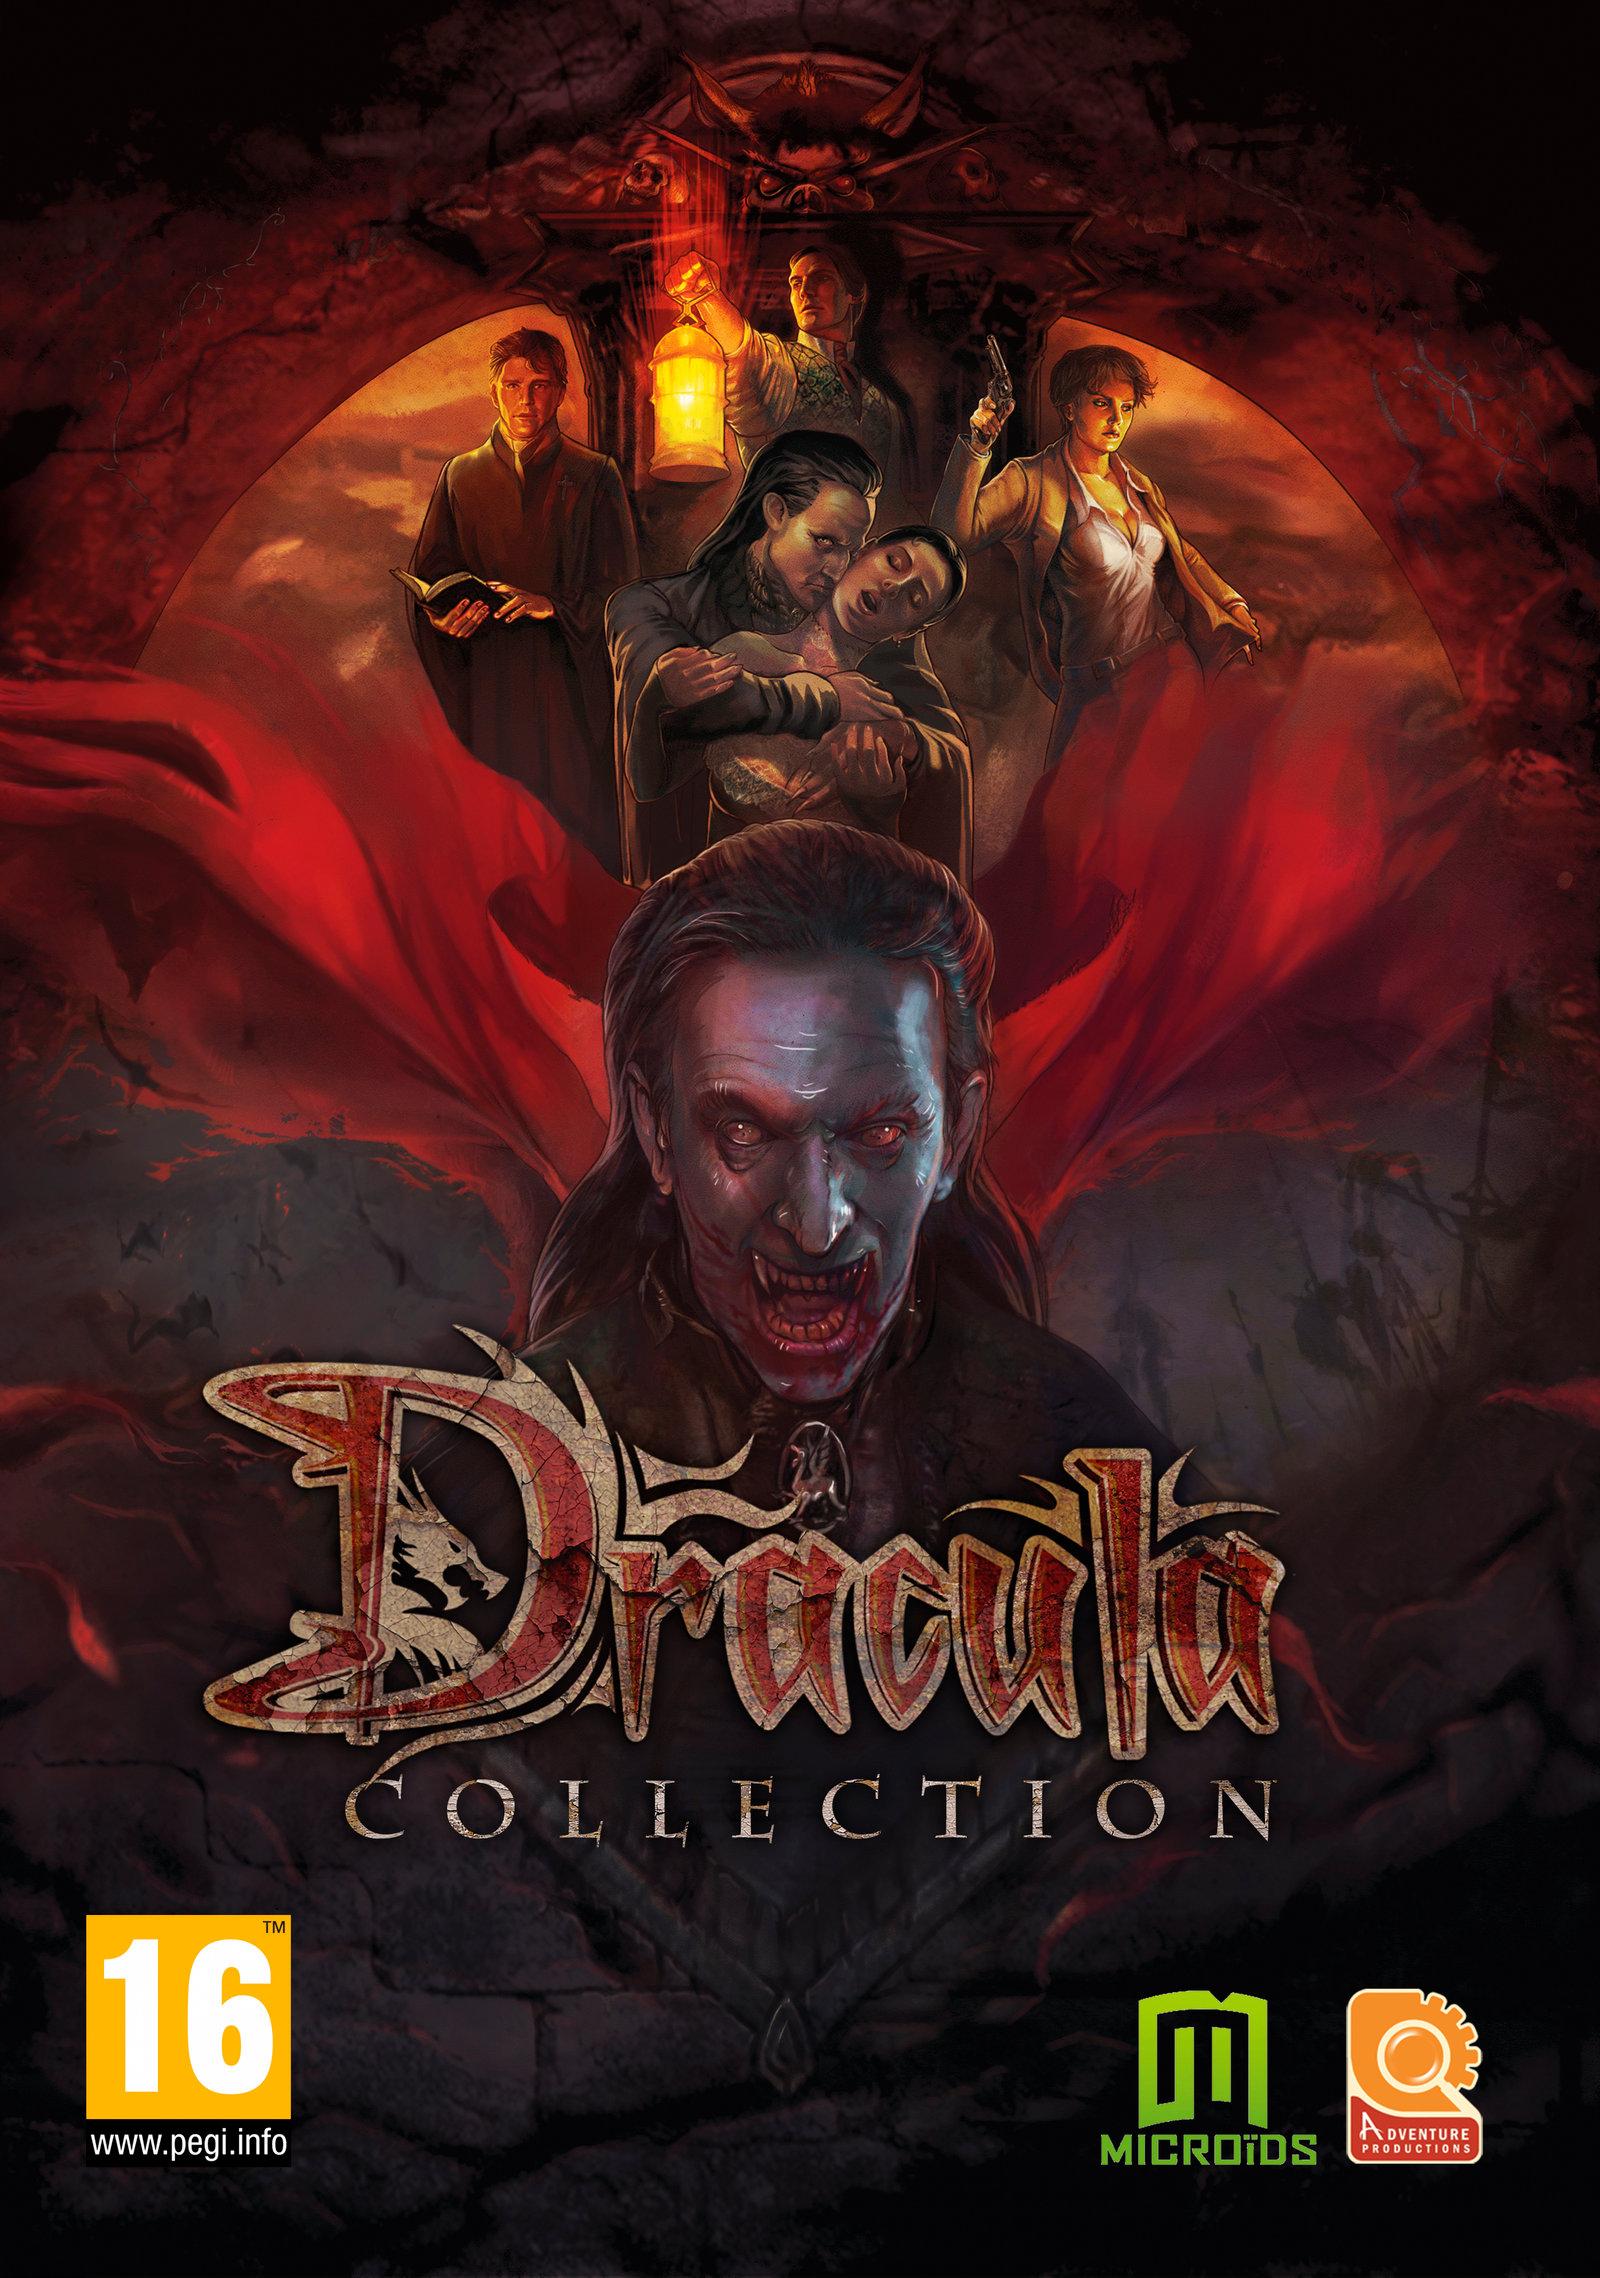 dracula storyline